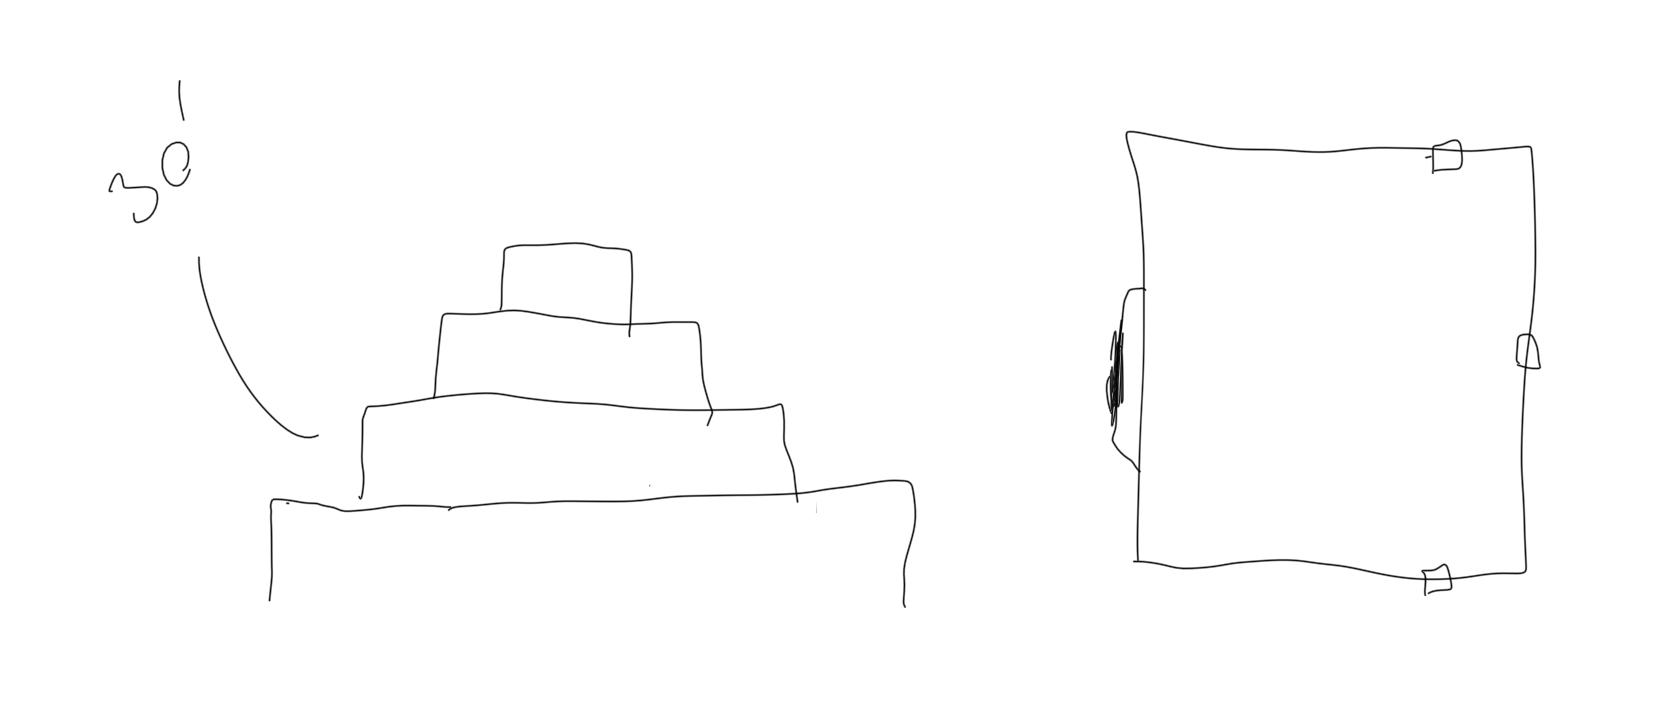 ziggurat.png